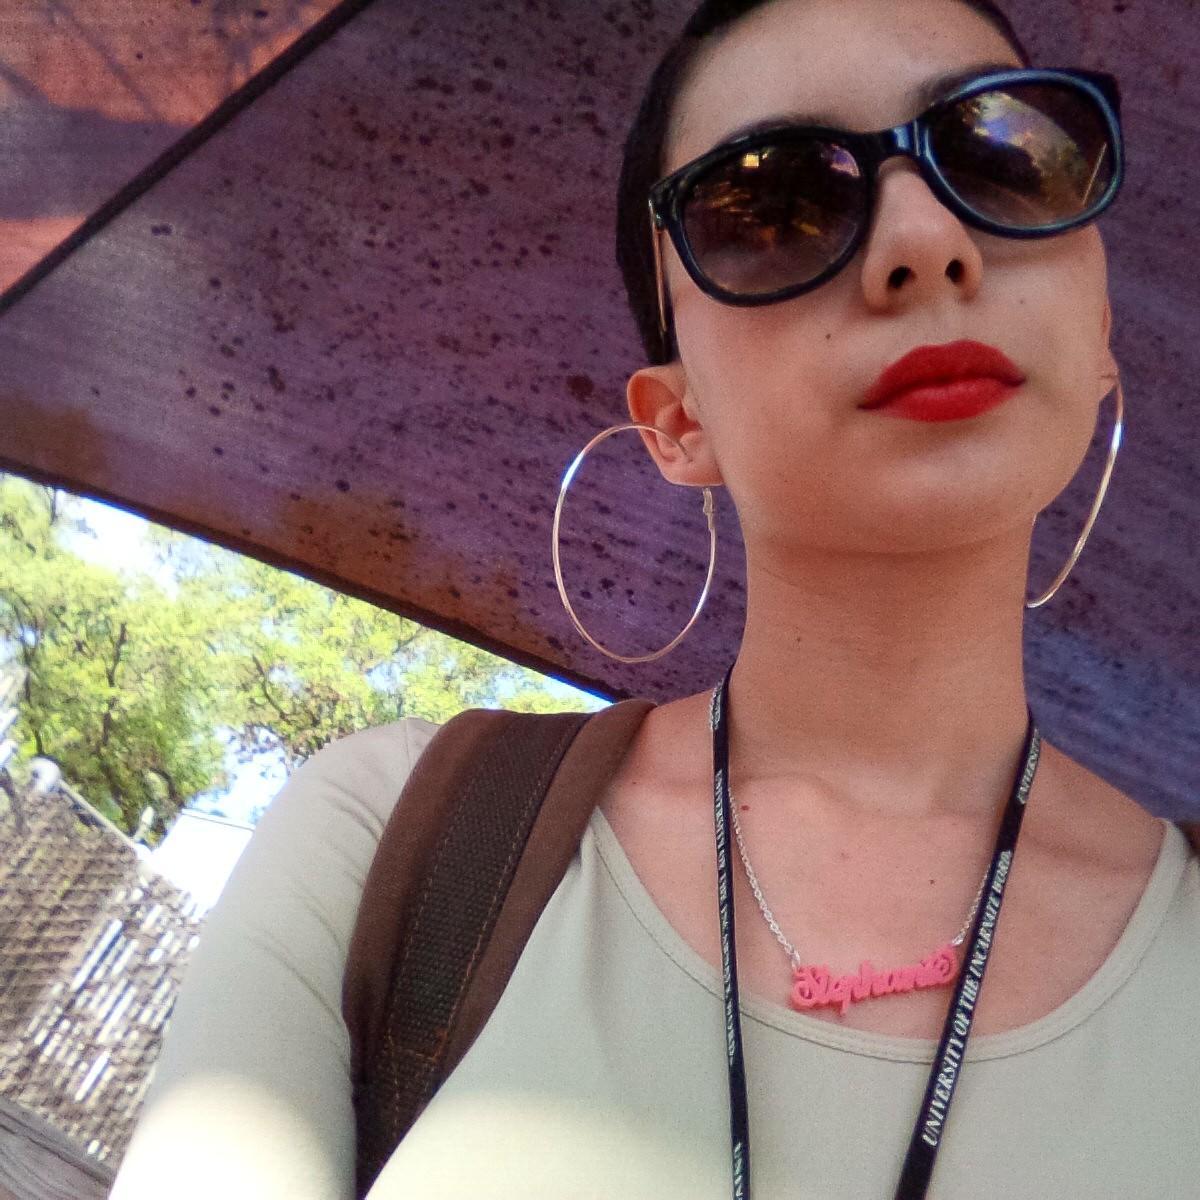 Stephanie Lugo Nude Photos 7